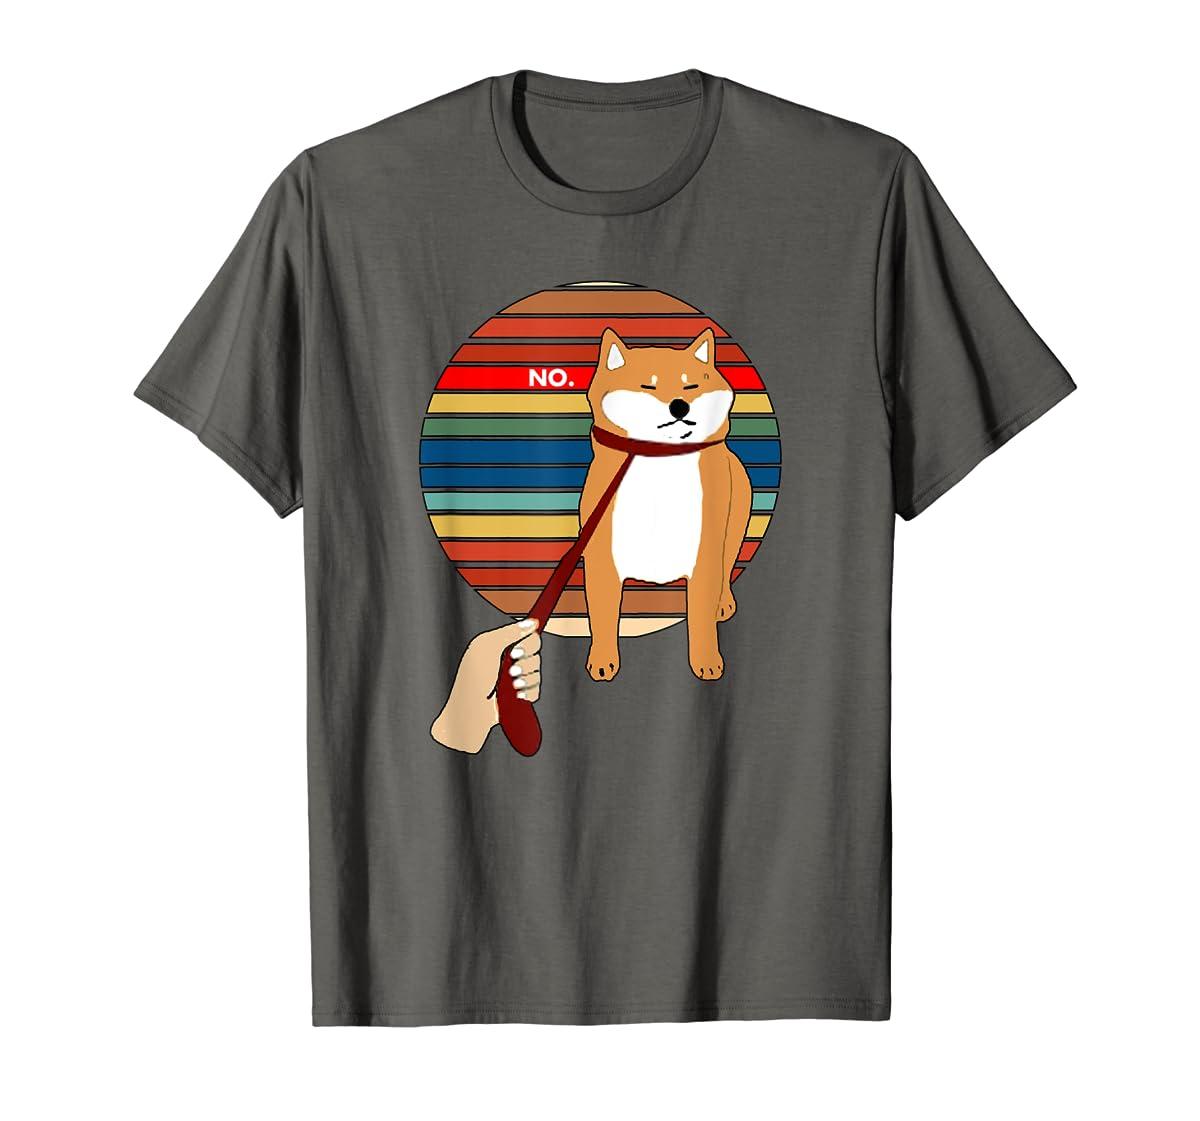 Cute Vintage Retro Shiba Inu Nope Dog Tee Shirt-Men's T-Shirt-Dark Heather